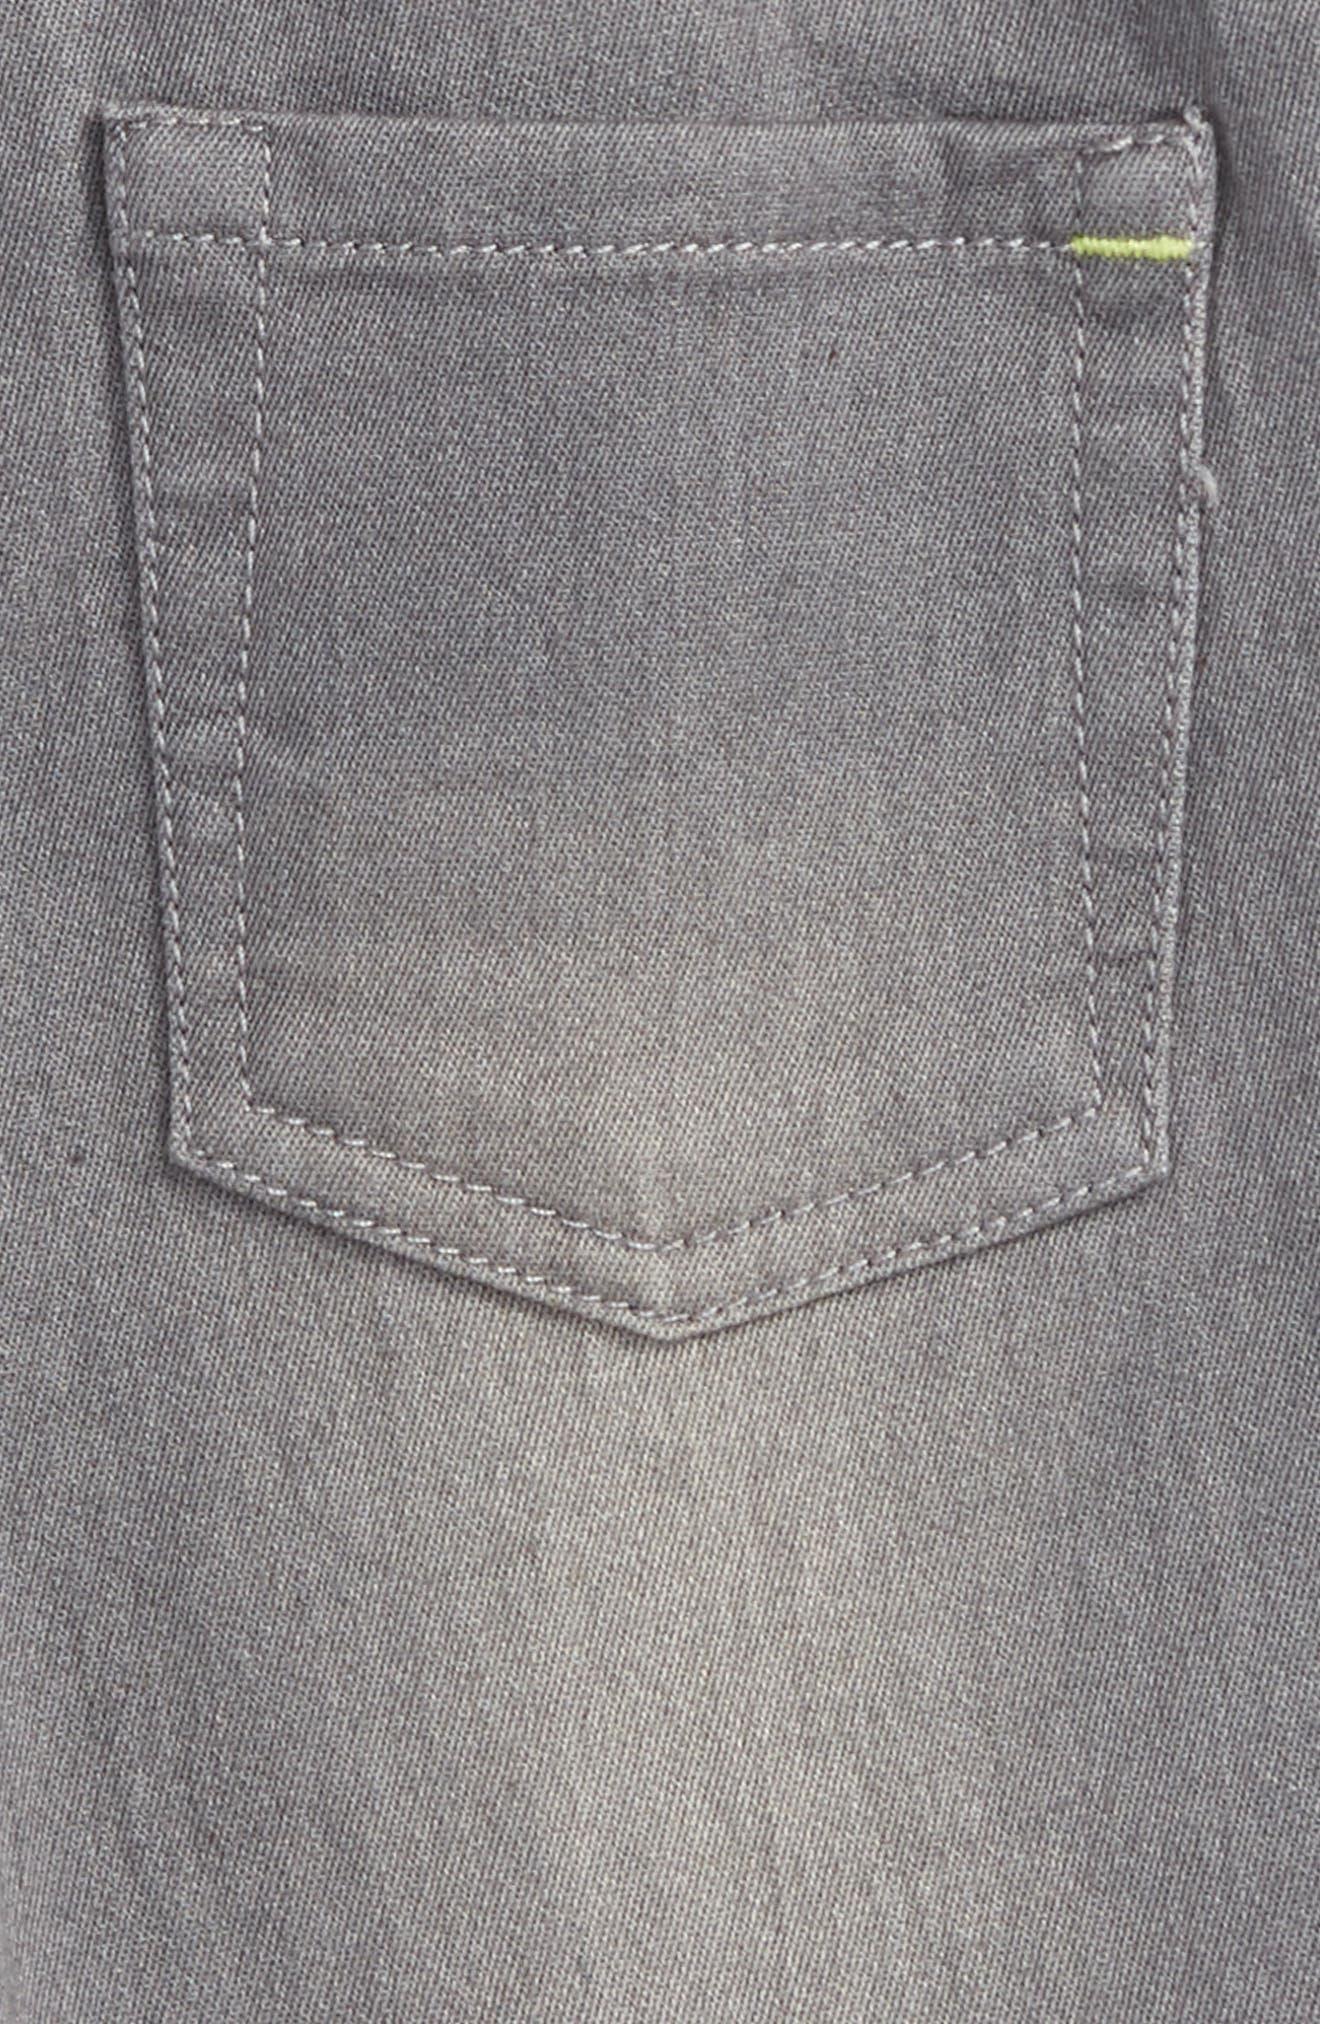 Drawstring Pants,                             Alternate thumbnail 2, color,                             020